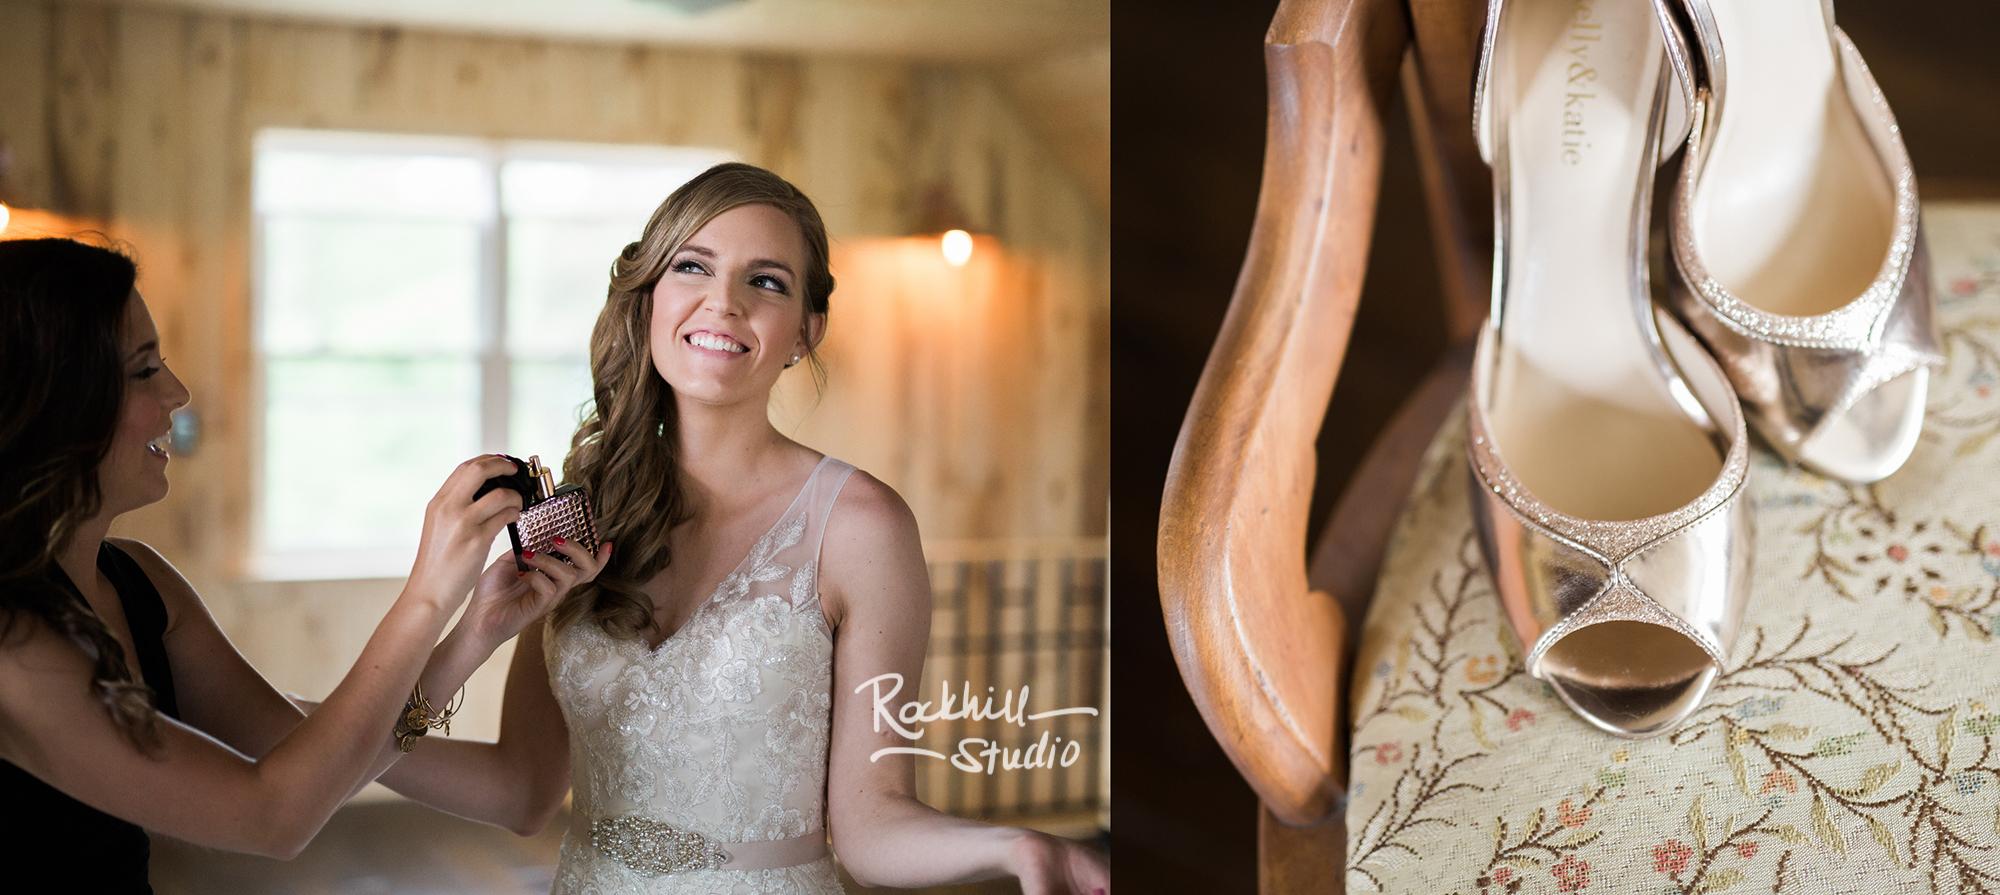 newberry-michigan-wedding-upper-peninsula-spring-photography-rockhill-ee-12.jpg